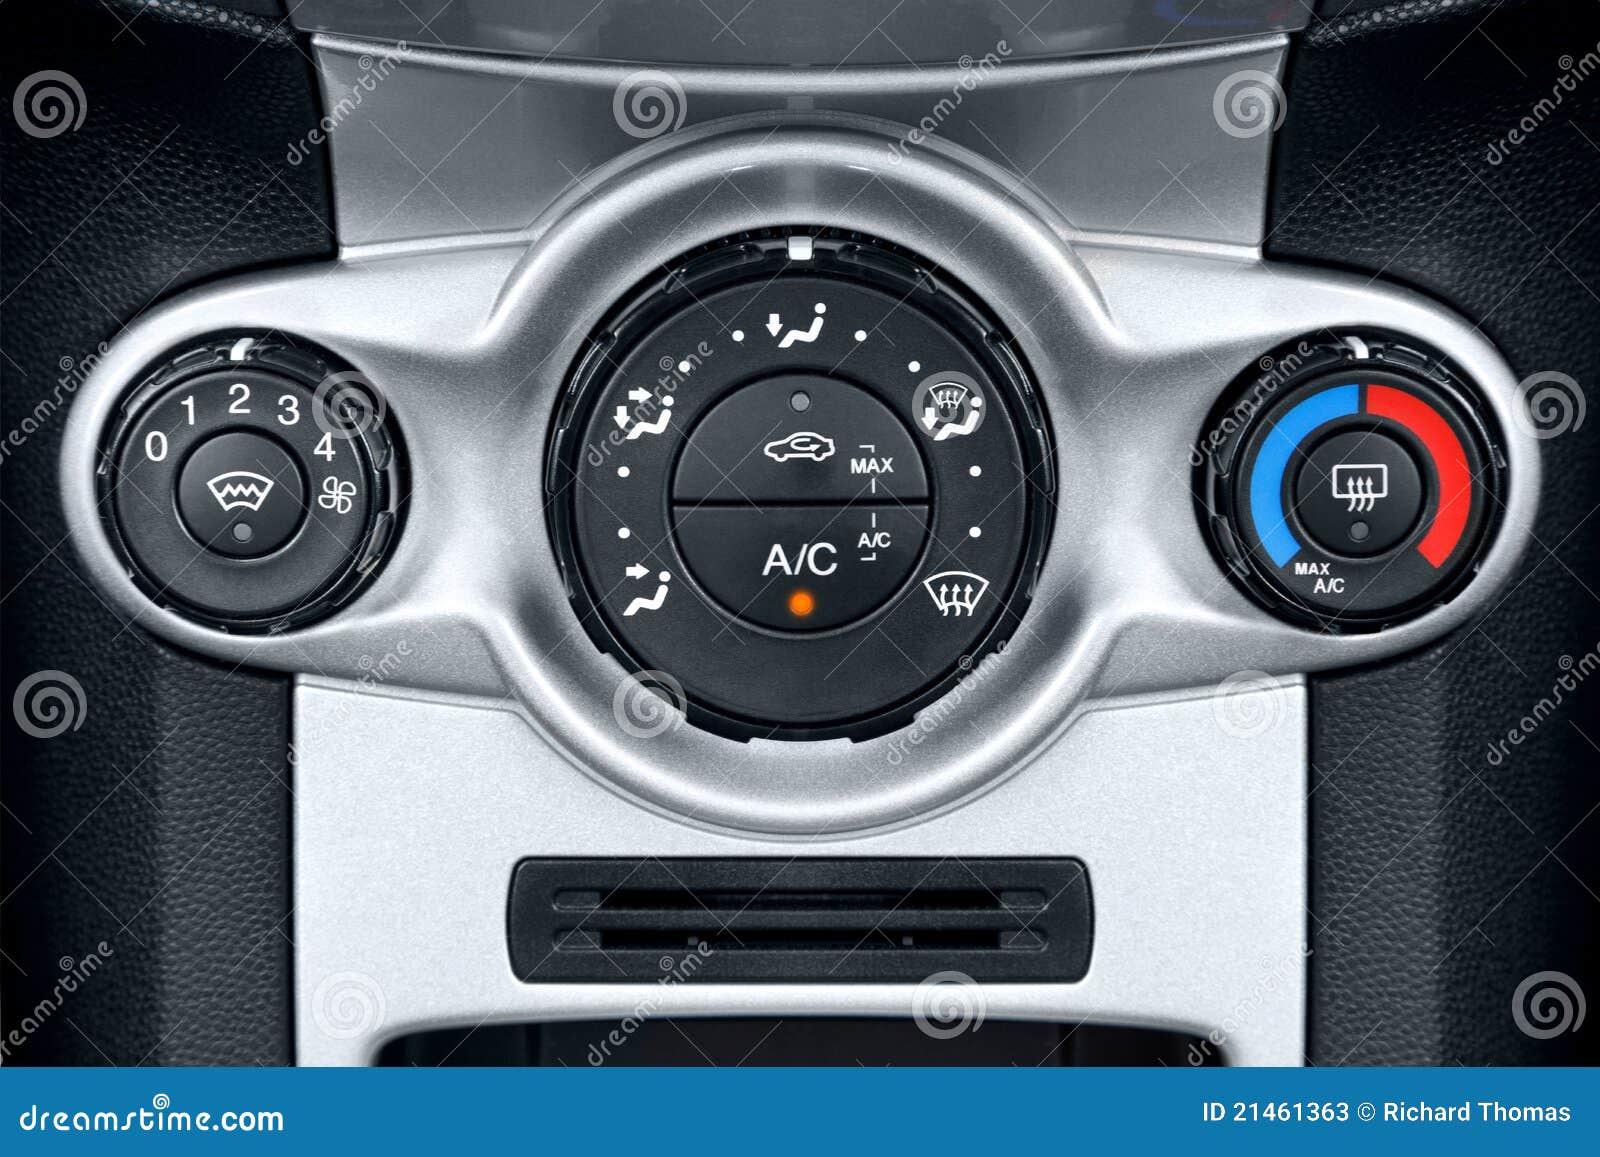 Gas Credit Cards >> Car Air Conditioning Controls Stock Photos - Image: 21461363